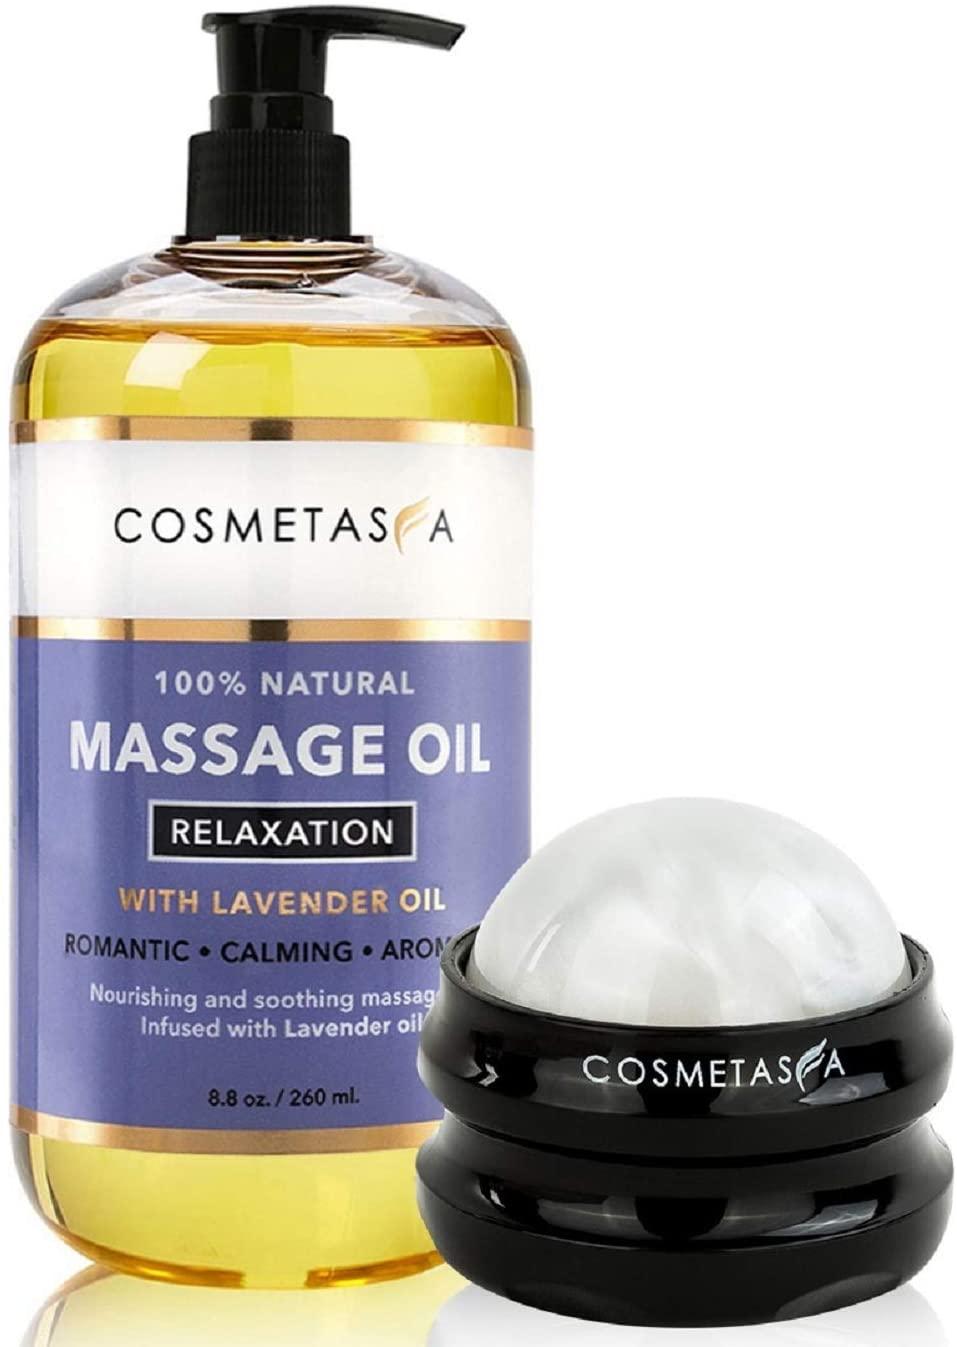 Cometasa Sensual Lavender Massage Oil, best massage oil